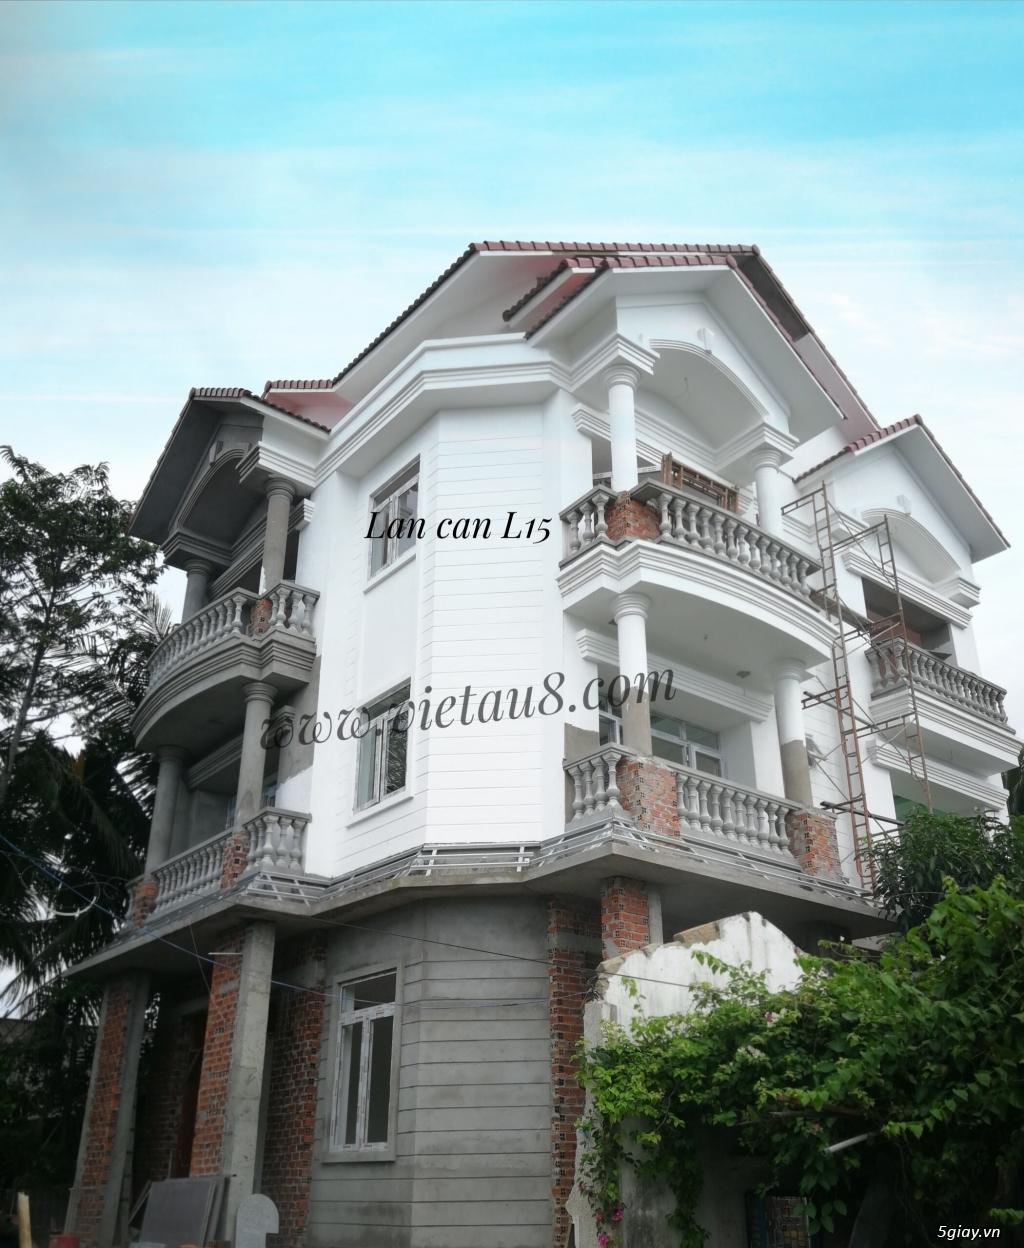 Lan can Việt Âu L15